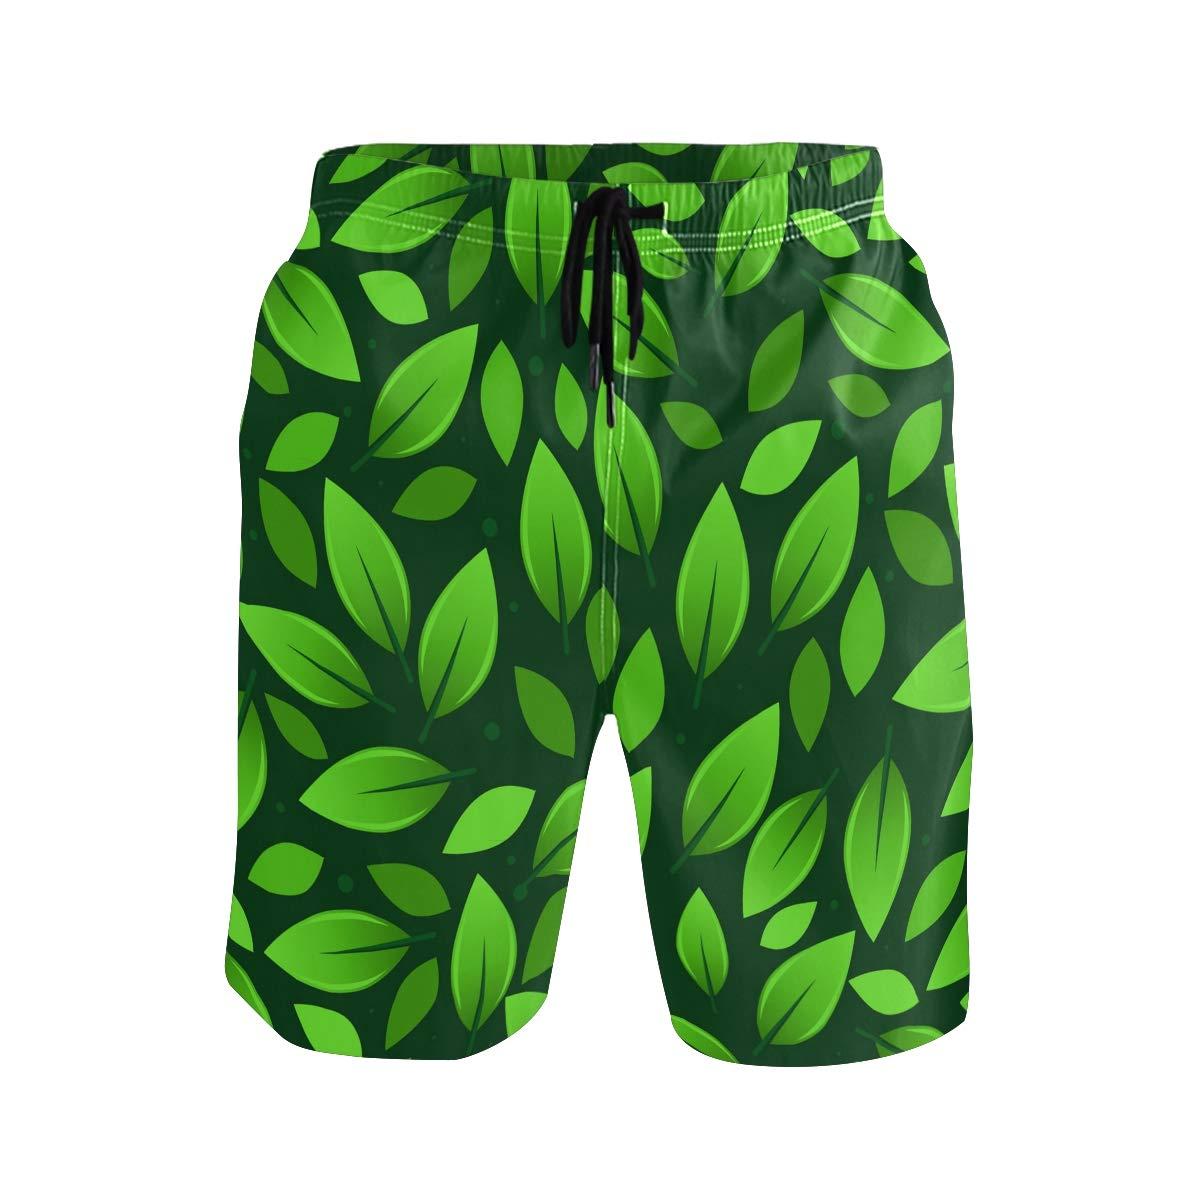 Mens Beach Swim Trunks Green Leaf Boxer Swimsuit Underwear Board Shorts with Pocket